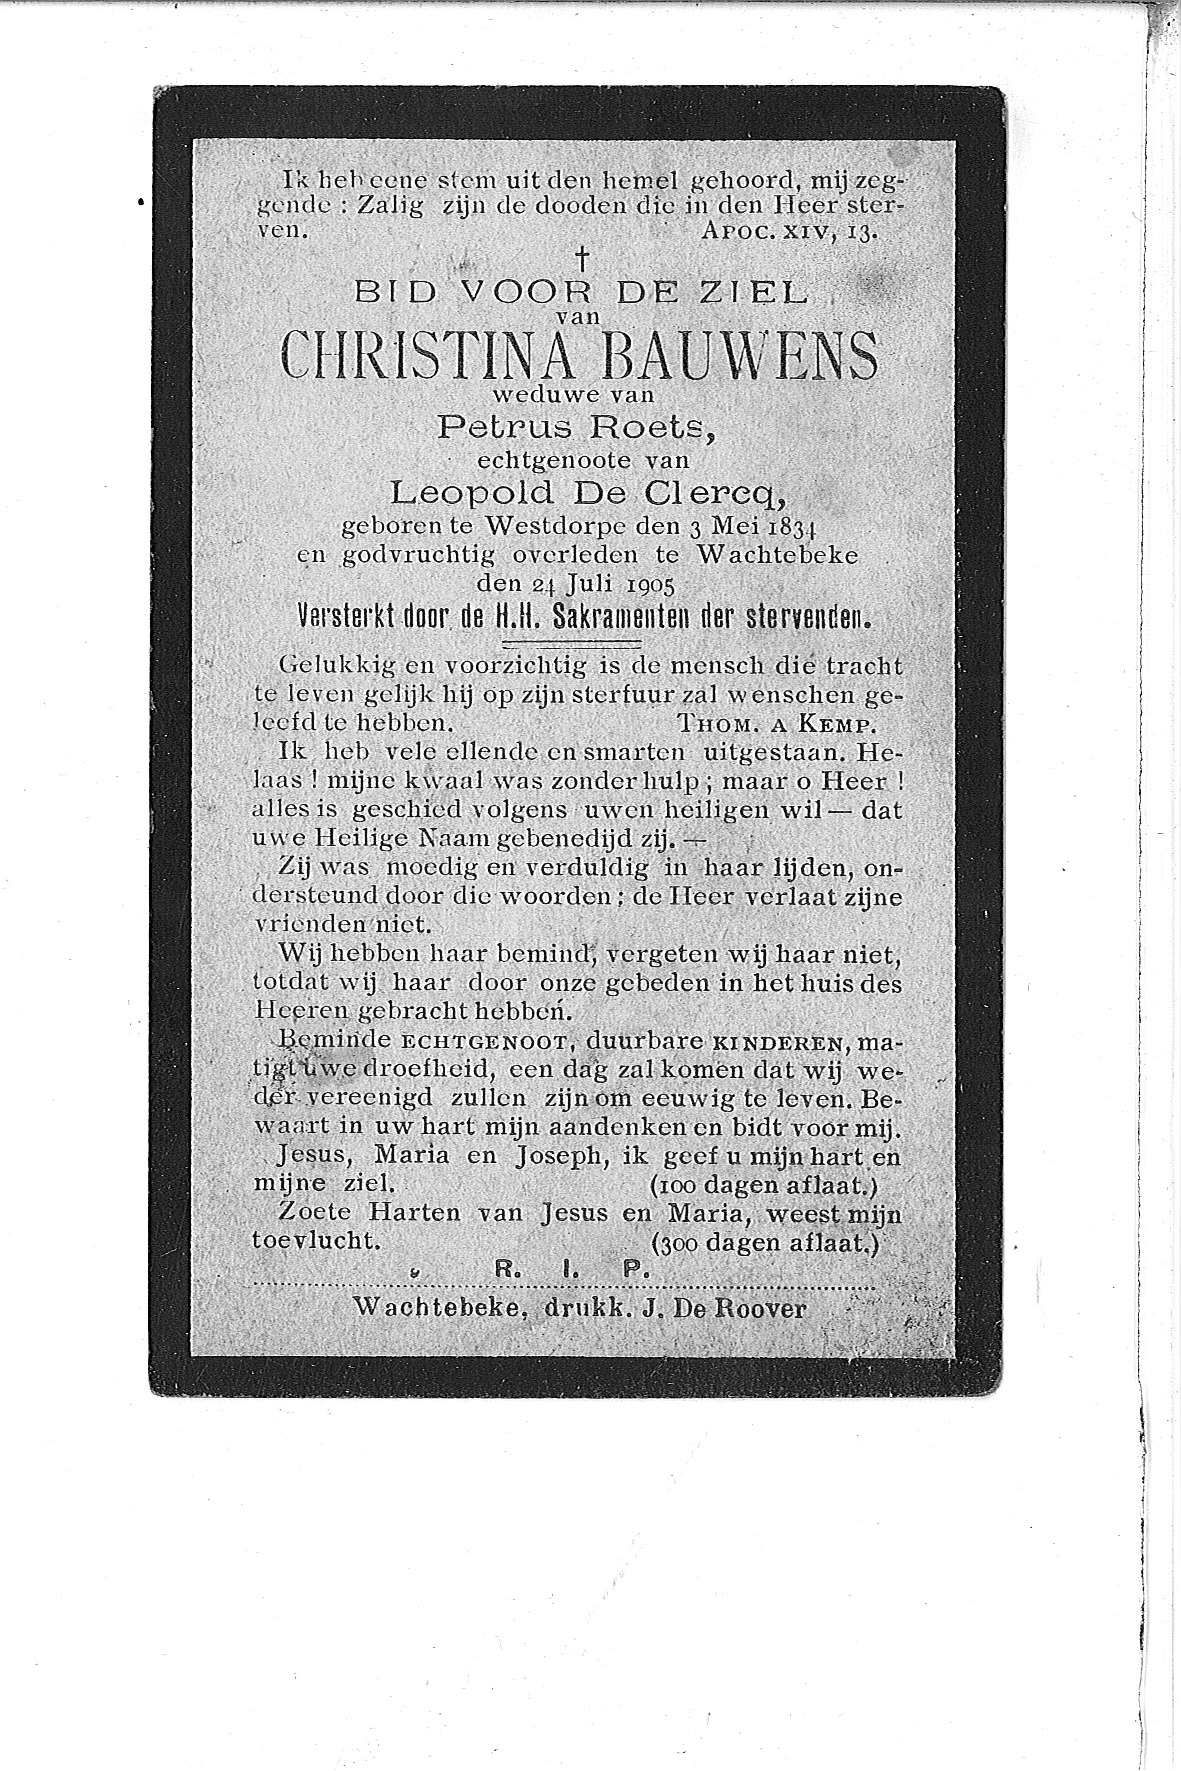 Christina(1905)20101026103900_00013.jpg